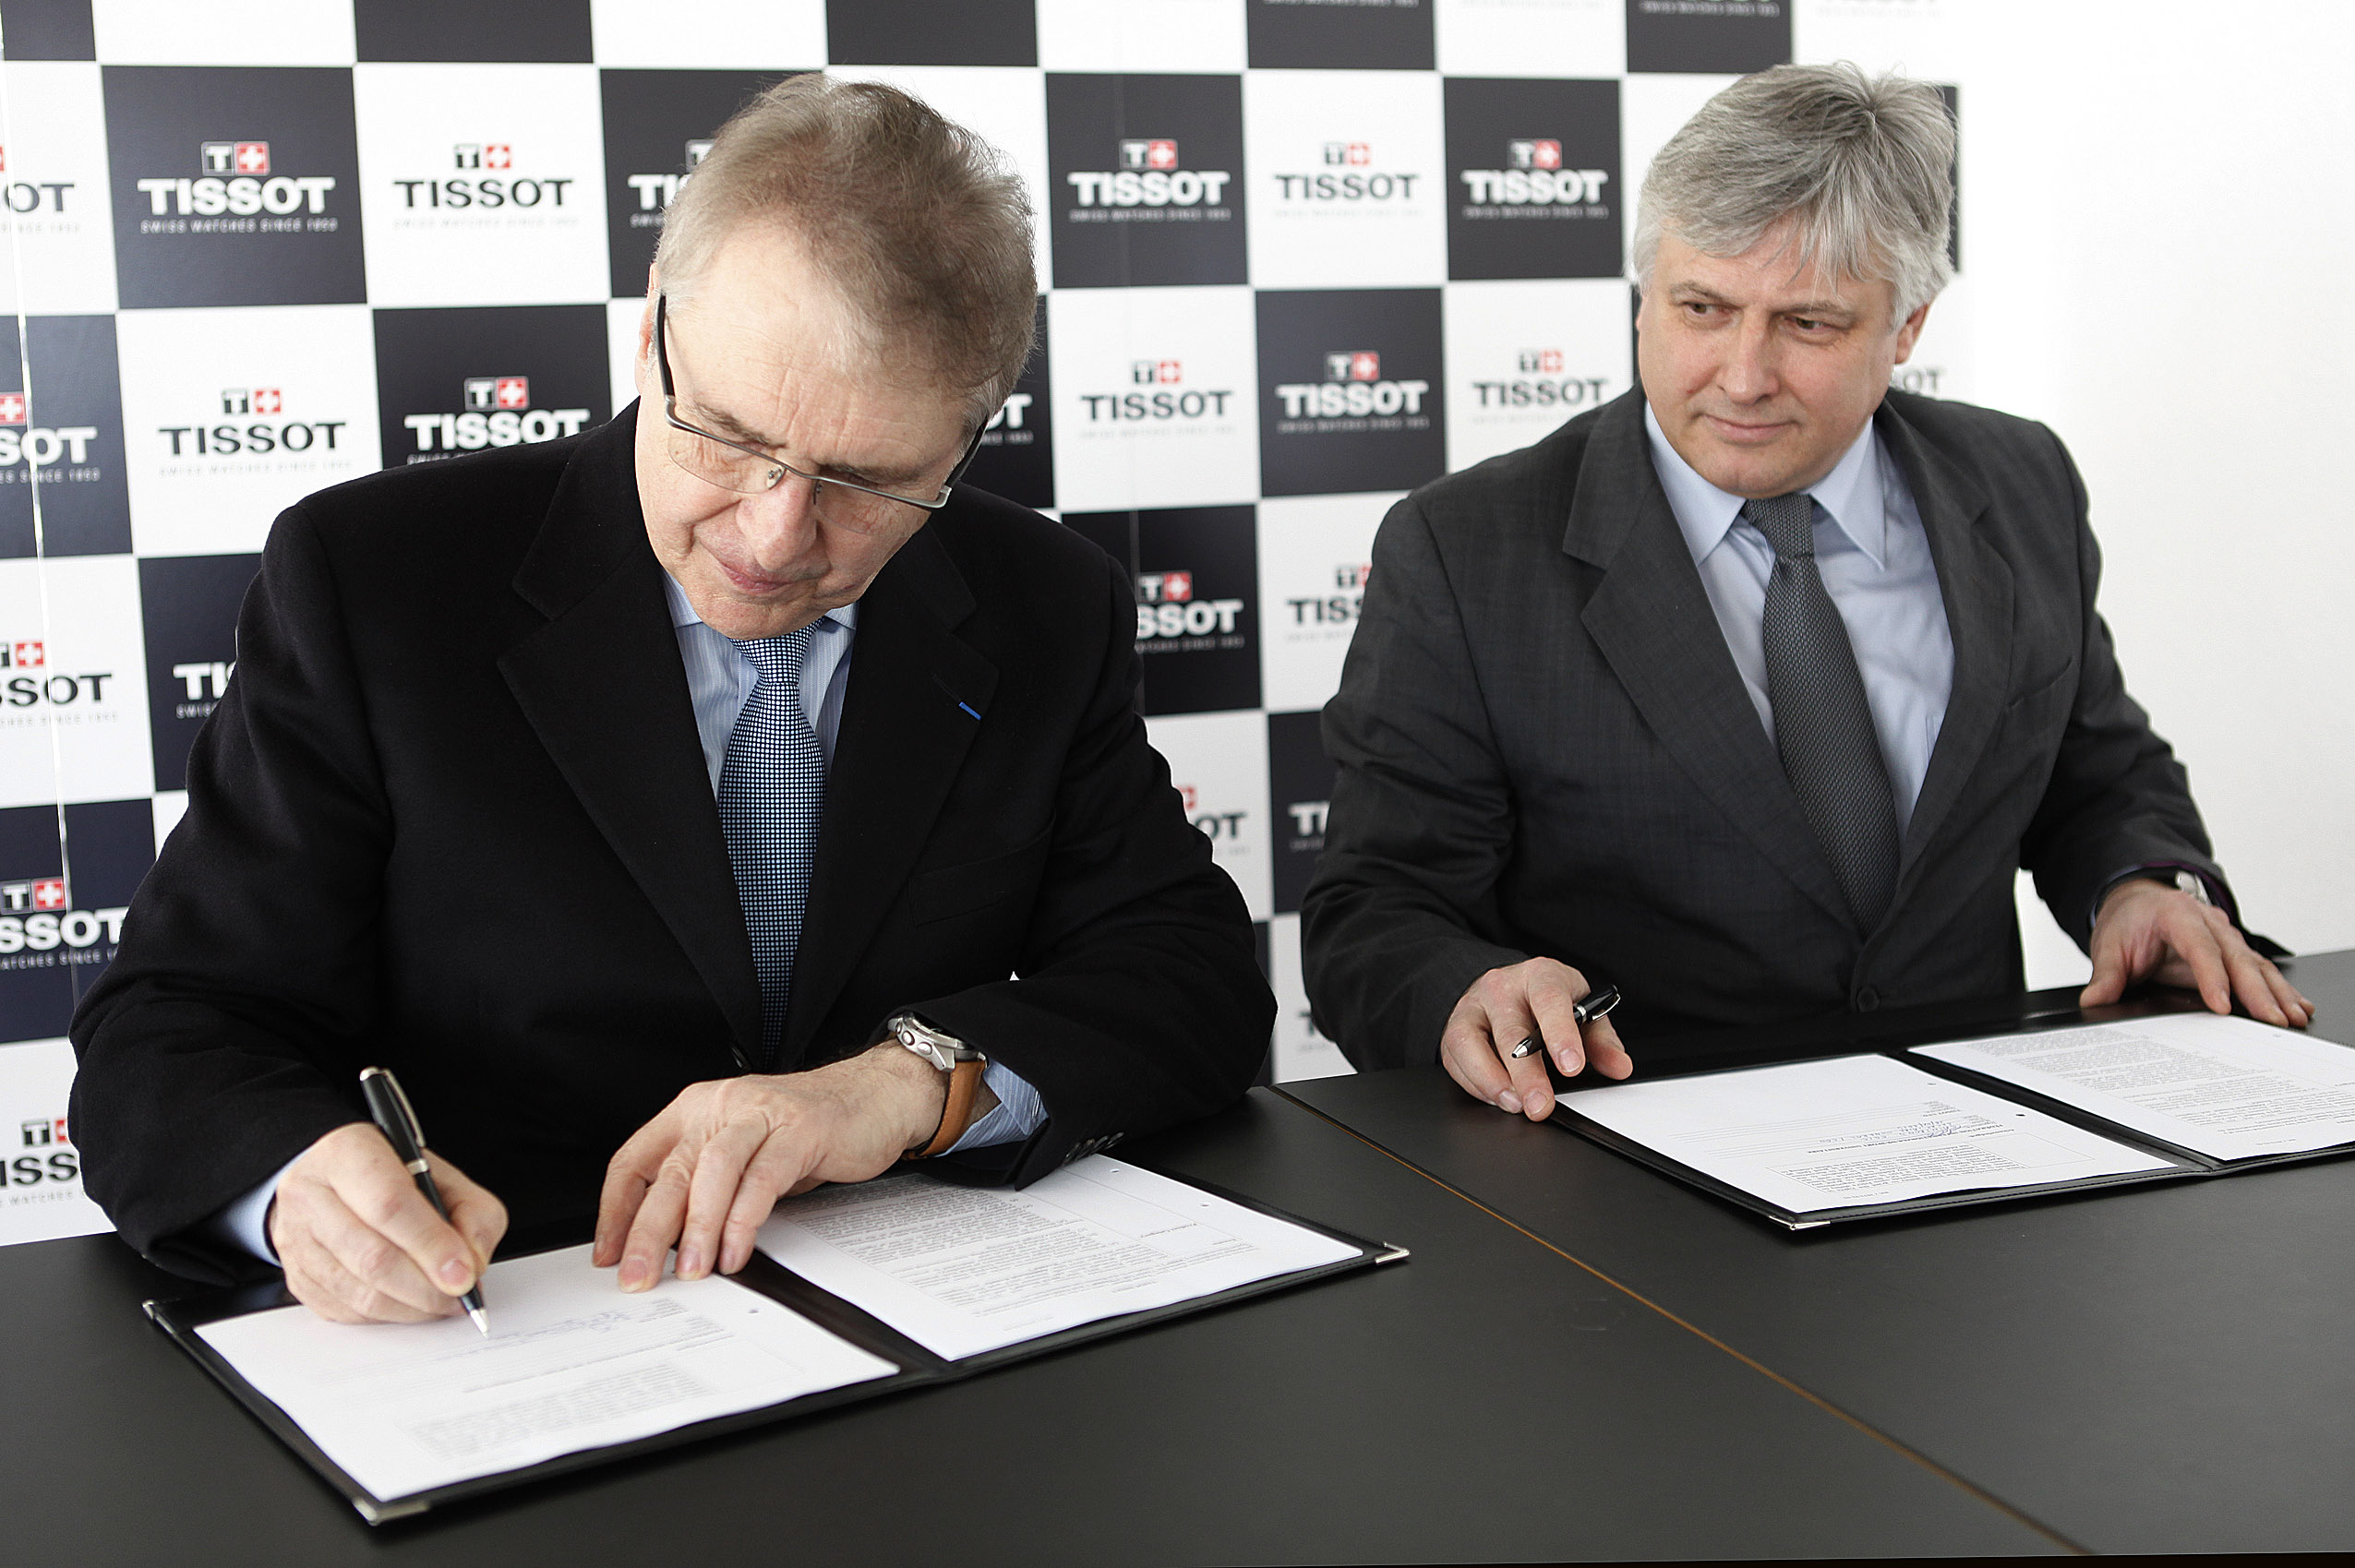 François Thiébaud  Eric Saintrond signing